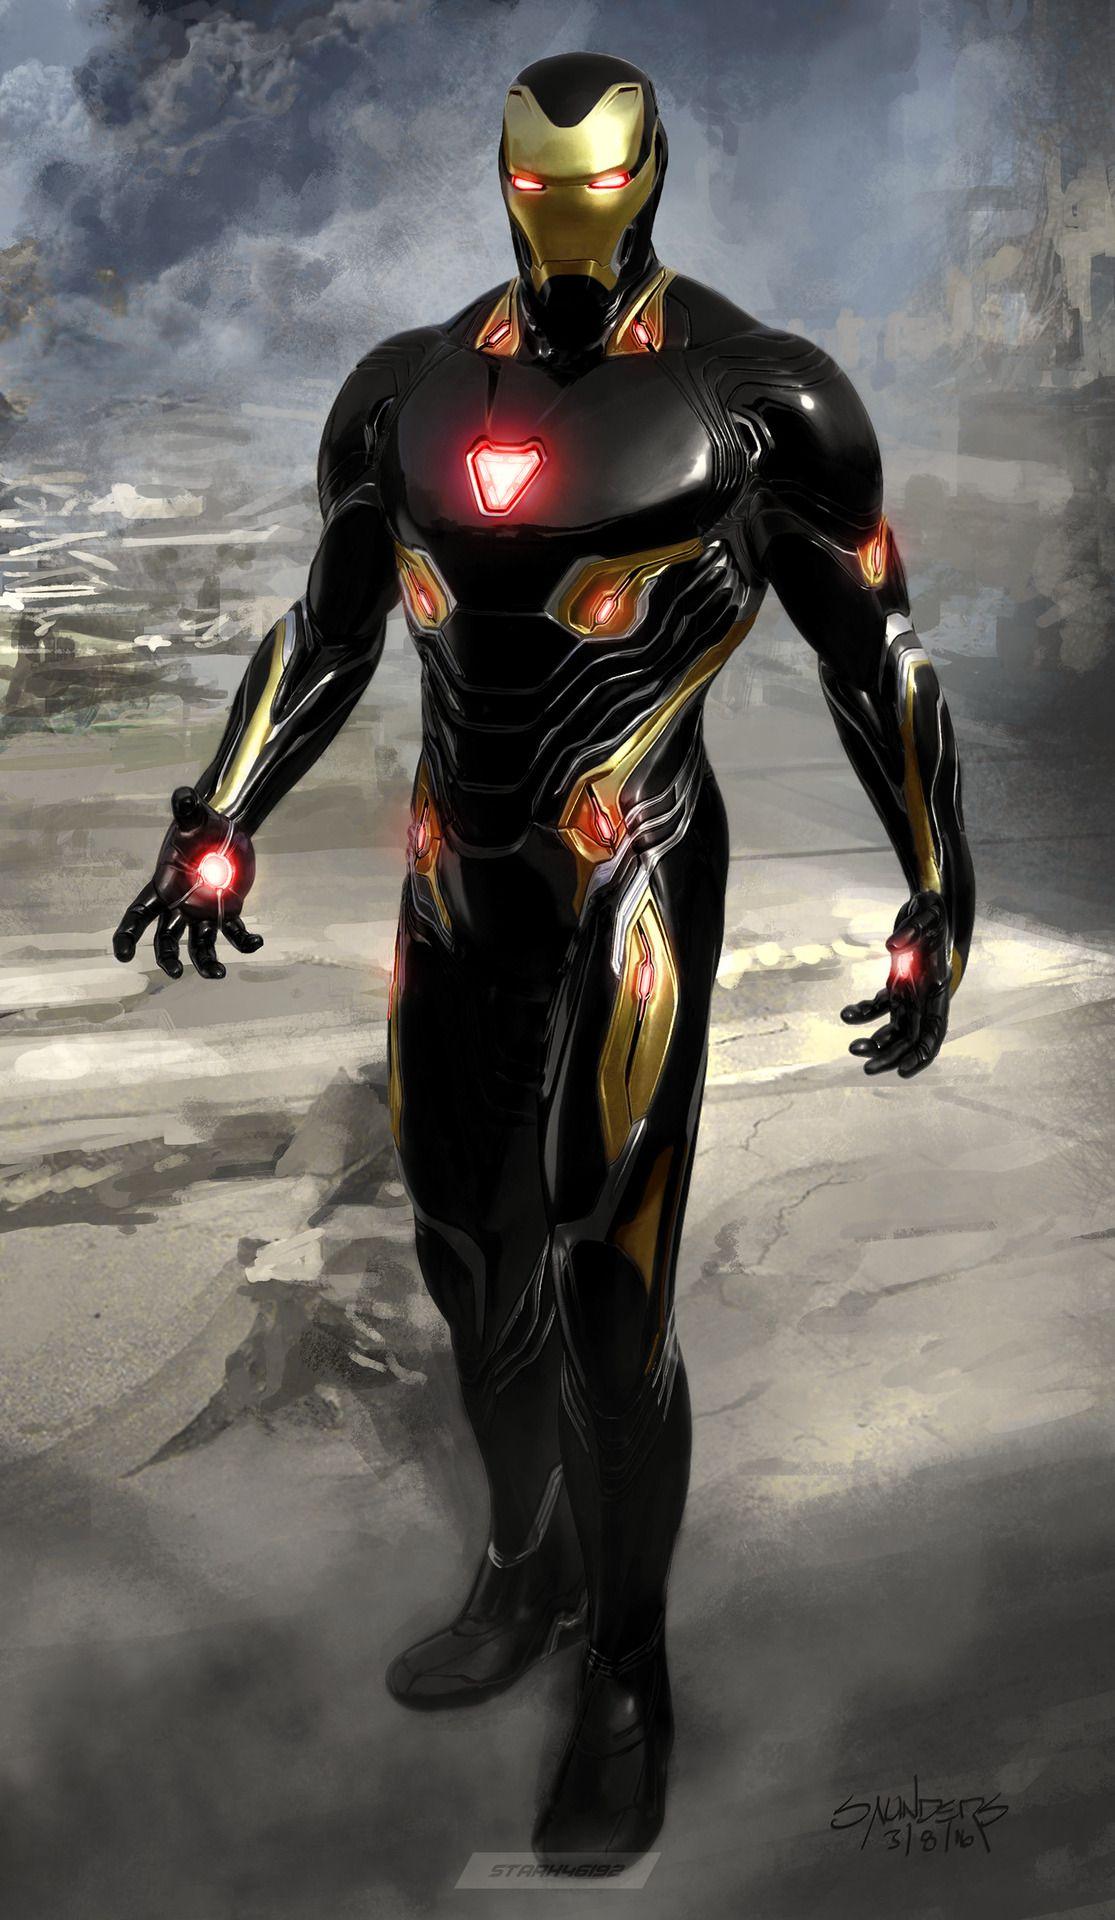 Man From Mars 2049 Ironman Mark L Armor Reimagined With Black And Iron Man Avengers Iron Man Armor Iron Man Art